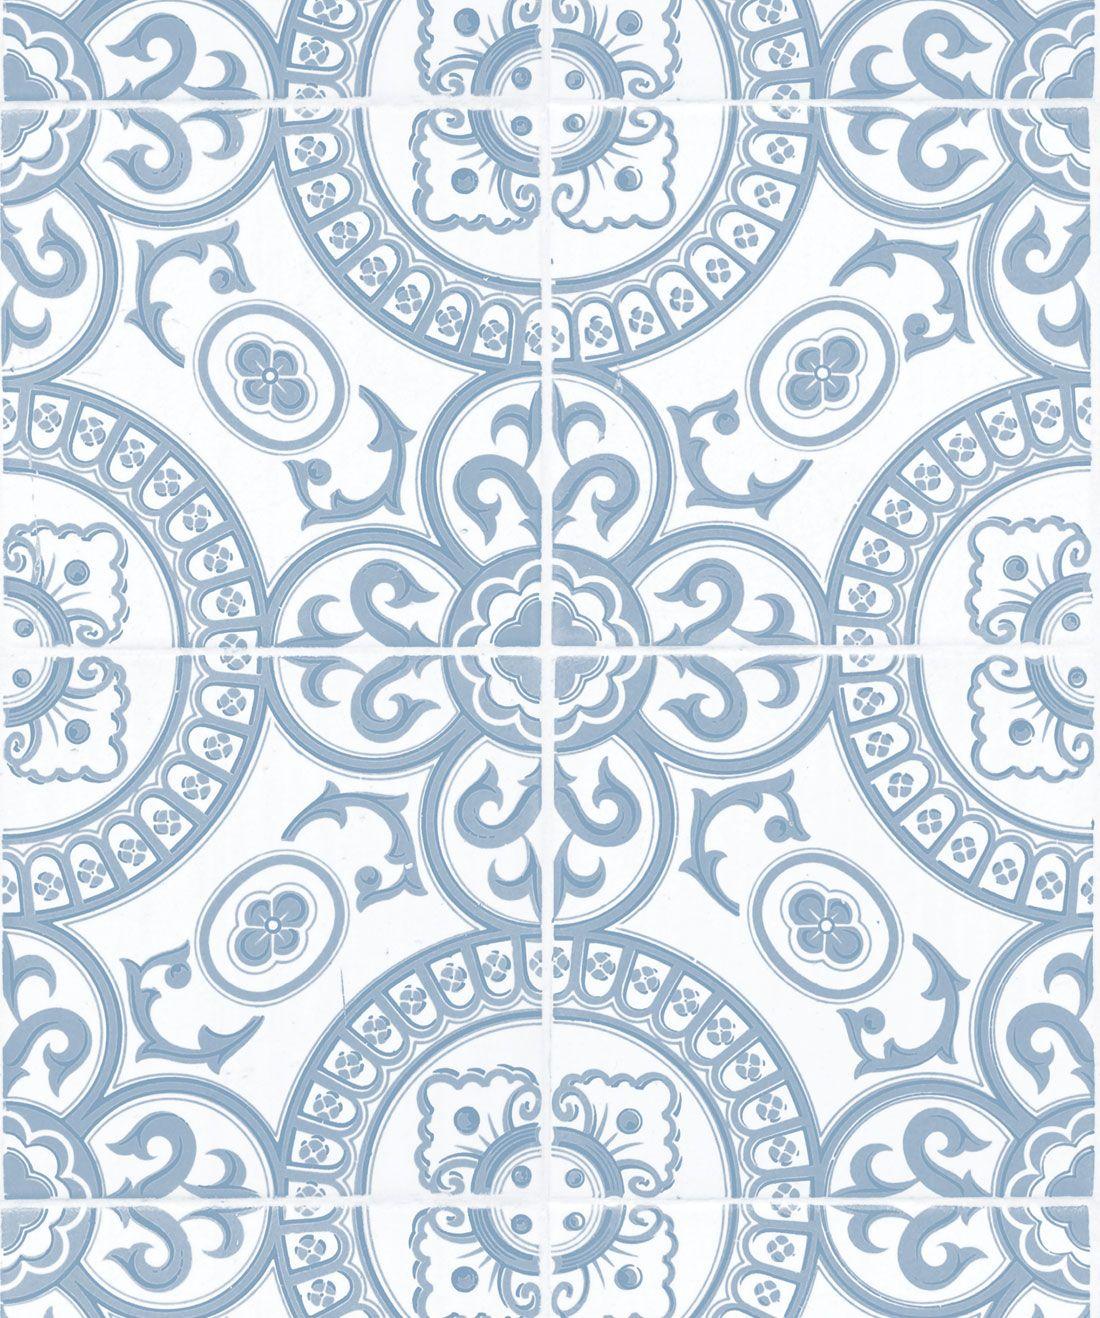 Heritage Tiles Wallpaper Authentic Cement Tile Design Milton King In 2021 Tile Wallpaper Blue And White Wallpaper Farmhouse Wallpaper